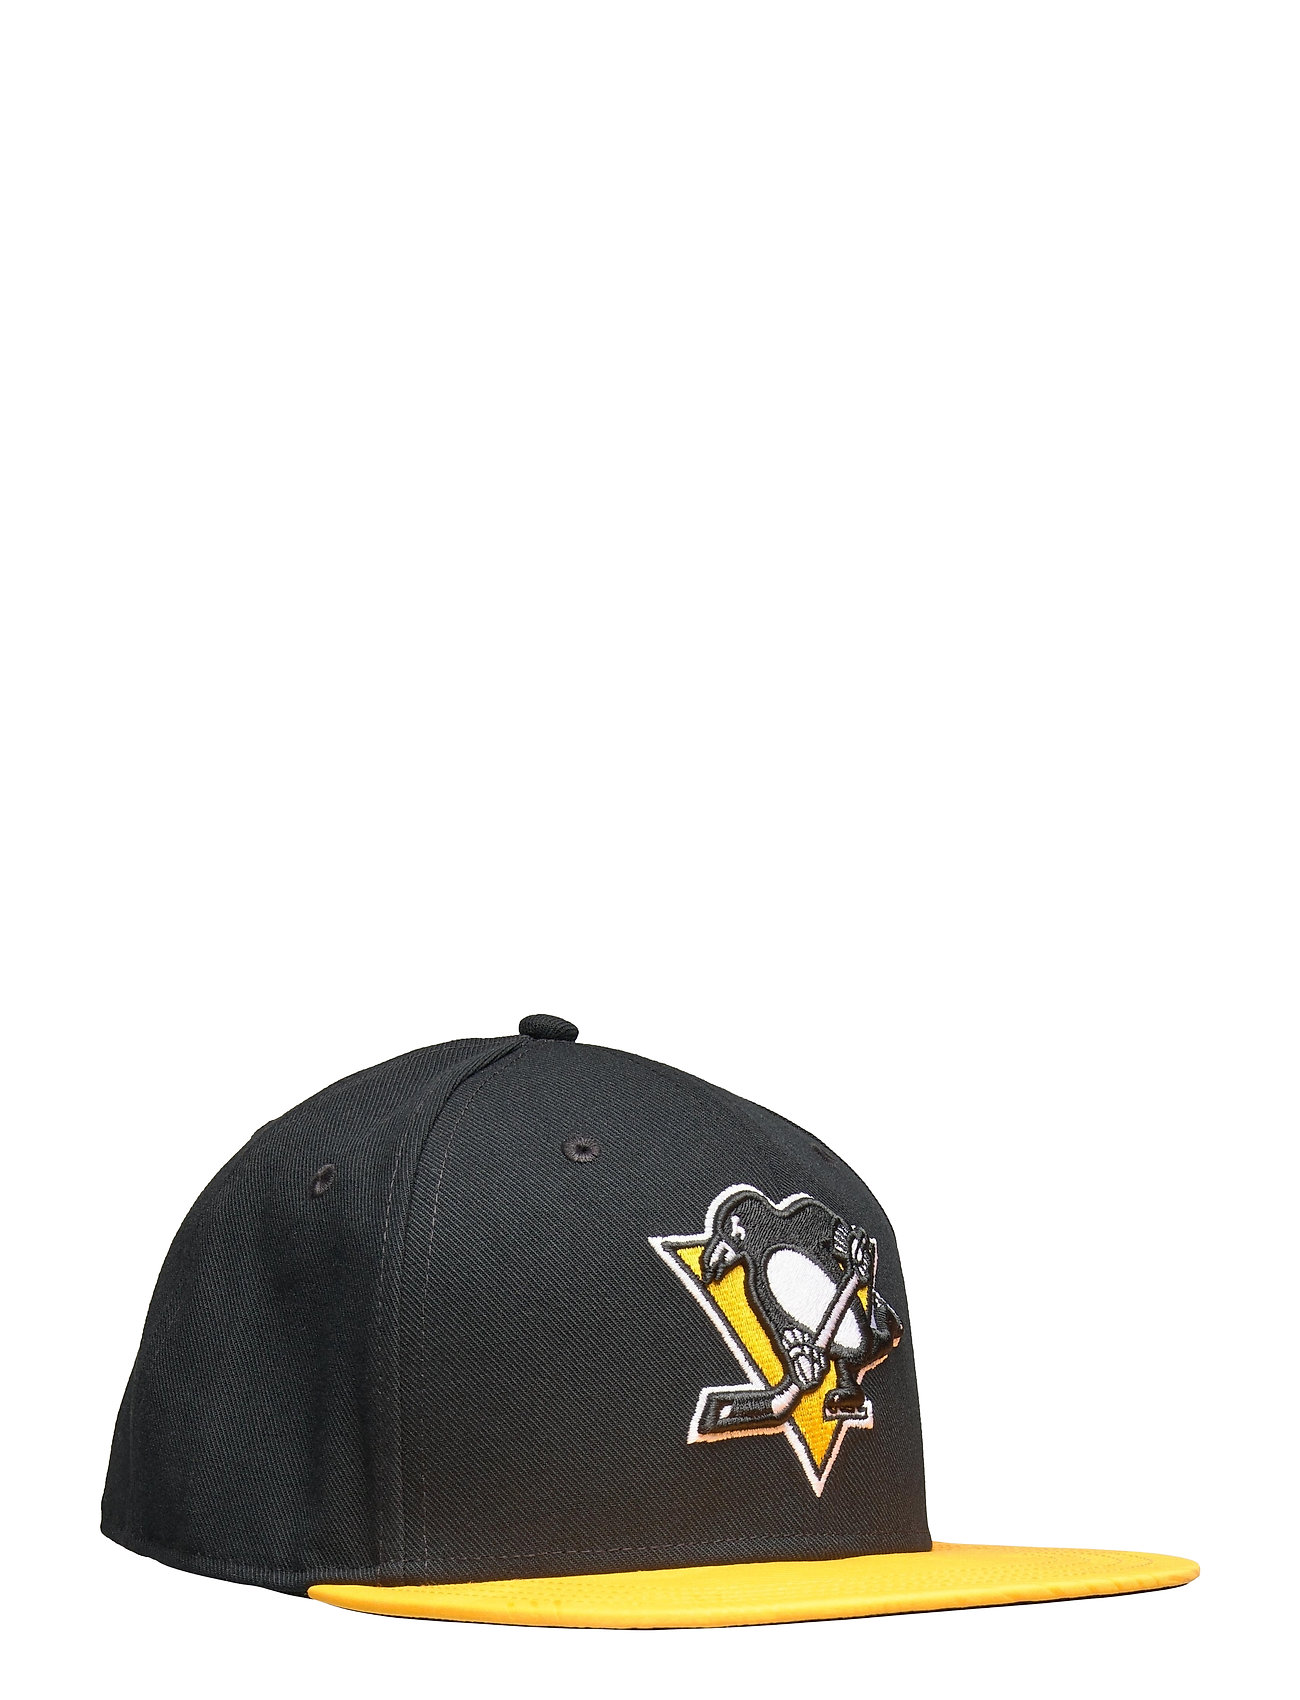 Image of Pittsburgh Penguins Iconic Defender Snapback Cap Accessories Headwear Caps Sort Fanatics (3486936811)